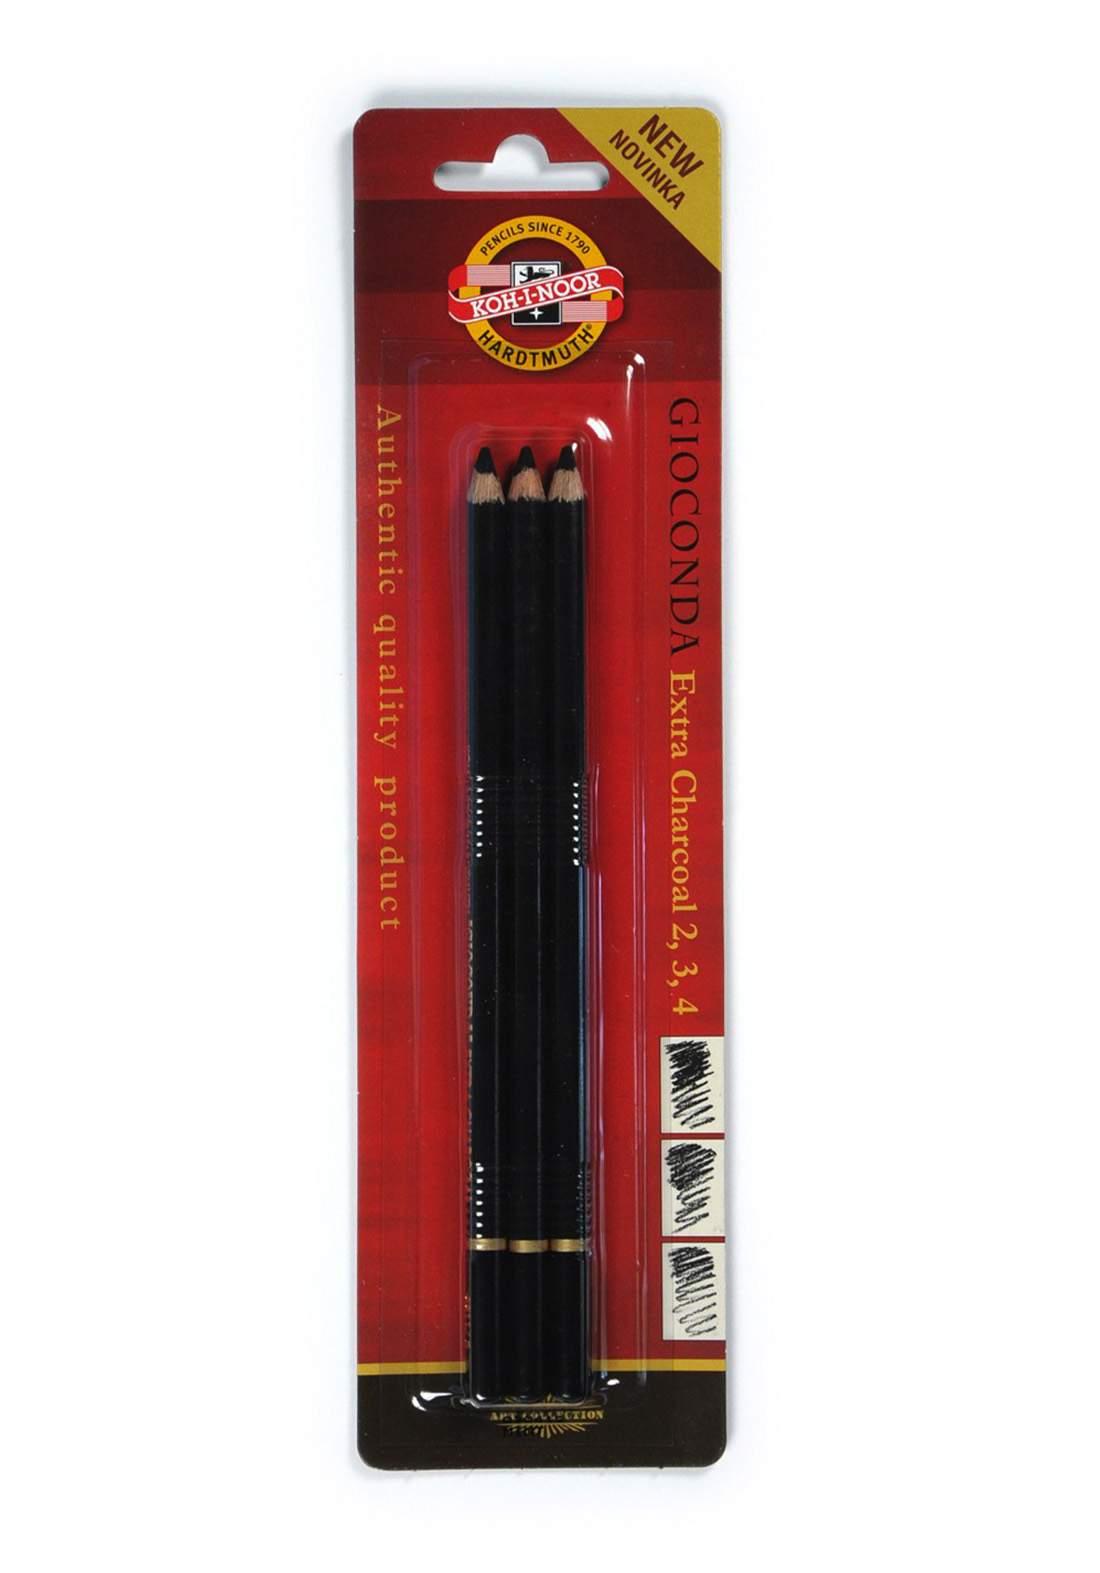 Koh-I-Noor Set Of 3 Charcoal Pencils -Blister سيت قلم فحم3 أقلام